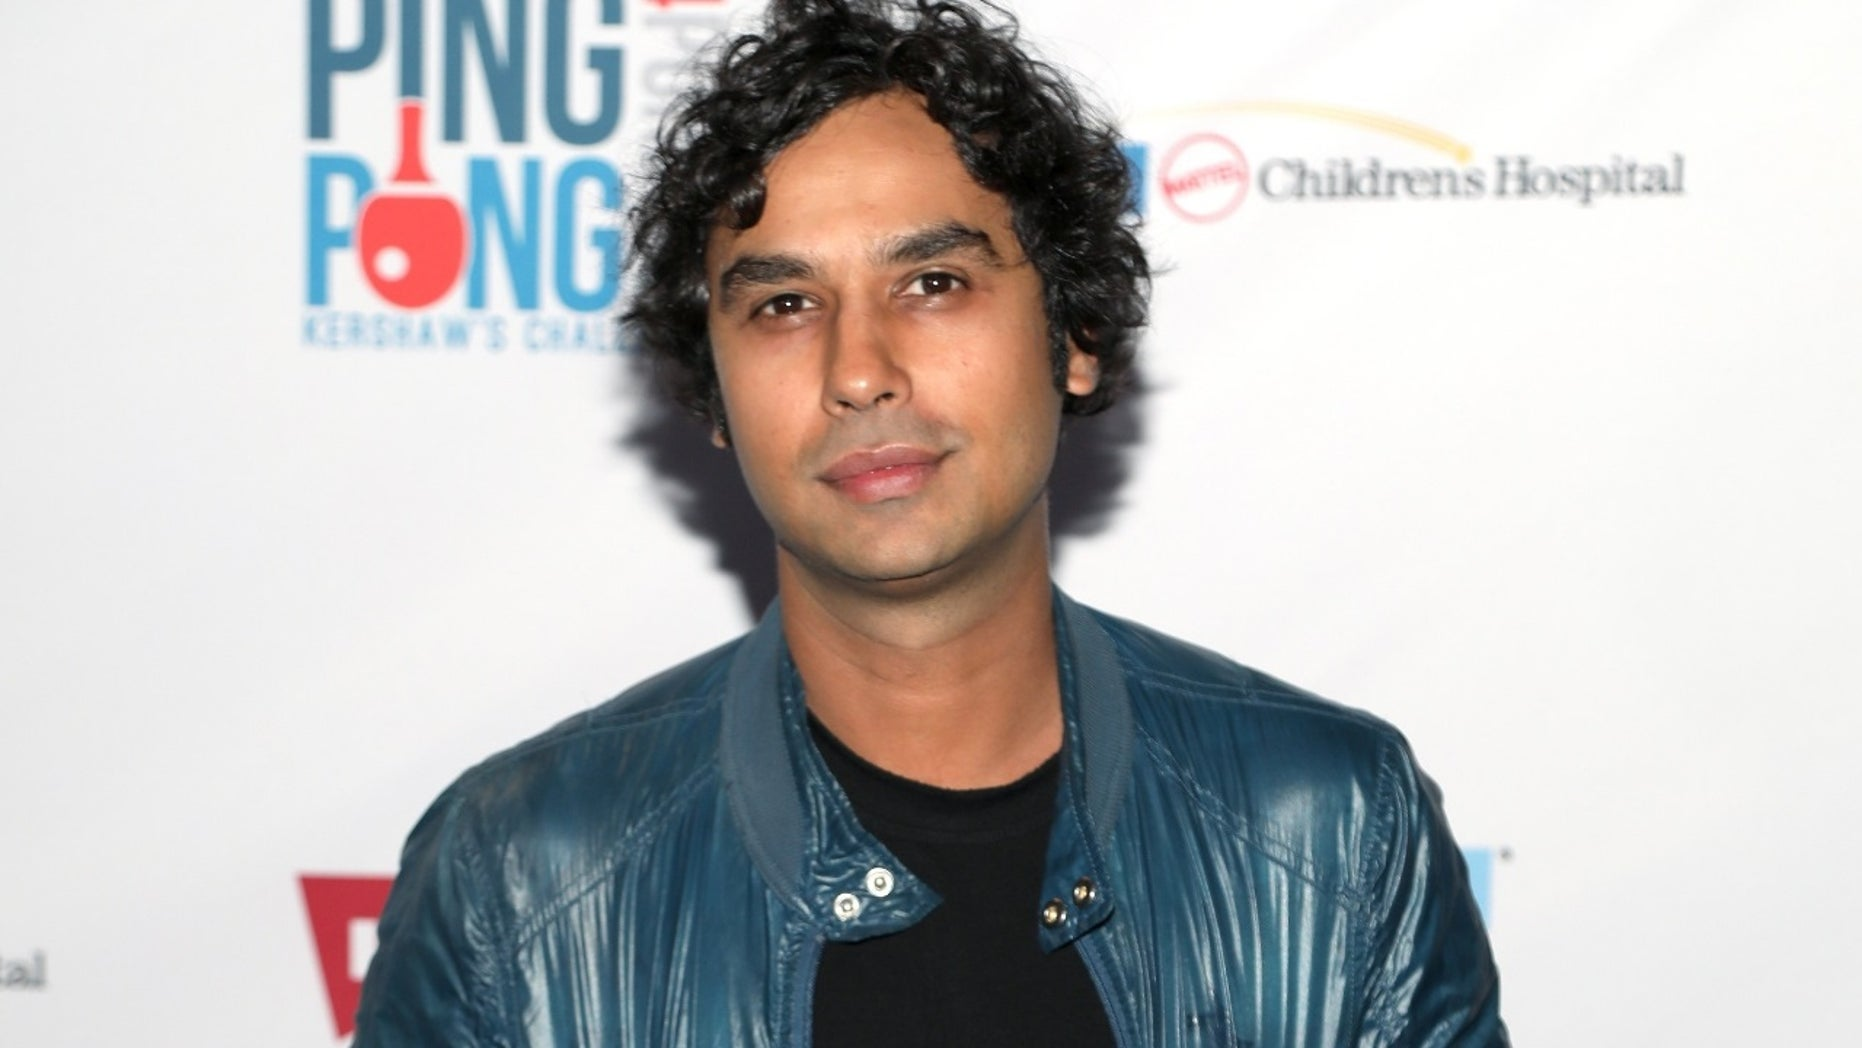 """Big Bang Theory"" star Kunal Nayyar reflected on the show ending, saying he would miss playing his character, Raj Koothrappali."